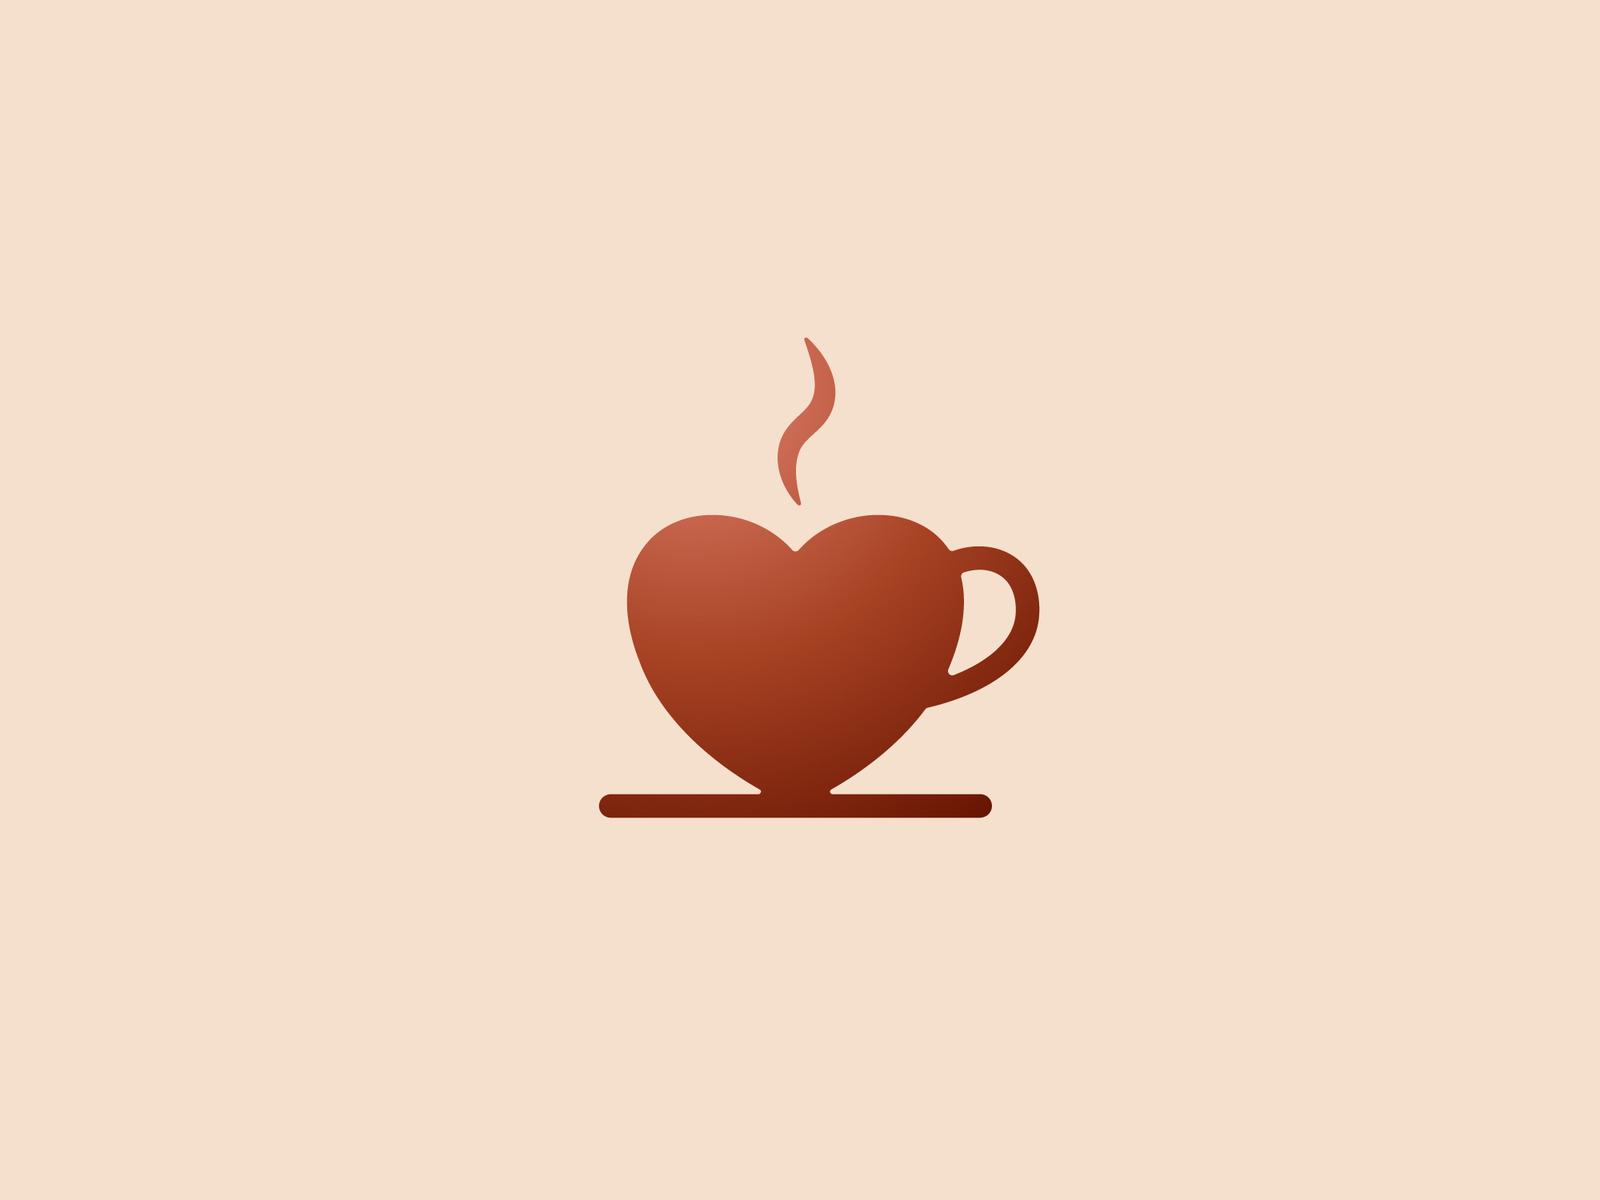 Coffee + Heart love simplicity minimal art icon illustraor adobe creative minimalist logo minimalist minimalism minimal logodesign logo morning like drink coffee heart